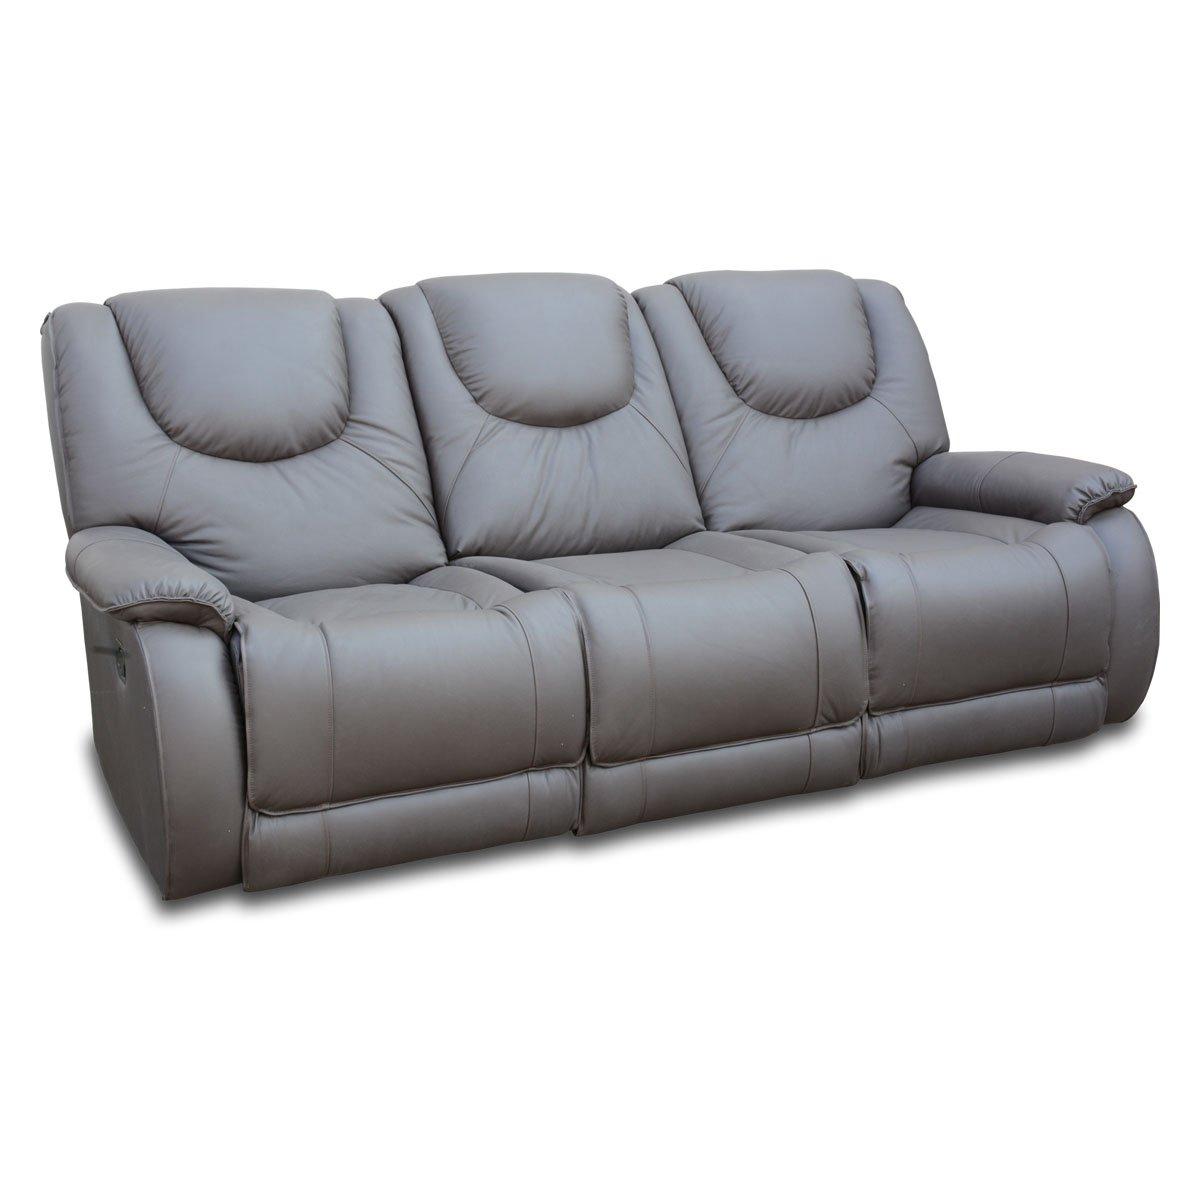 Sillon reclinable trendy familia silln reclinable sx dark for Sillones de 1 plaza baratos